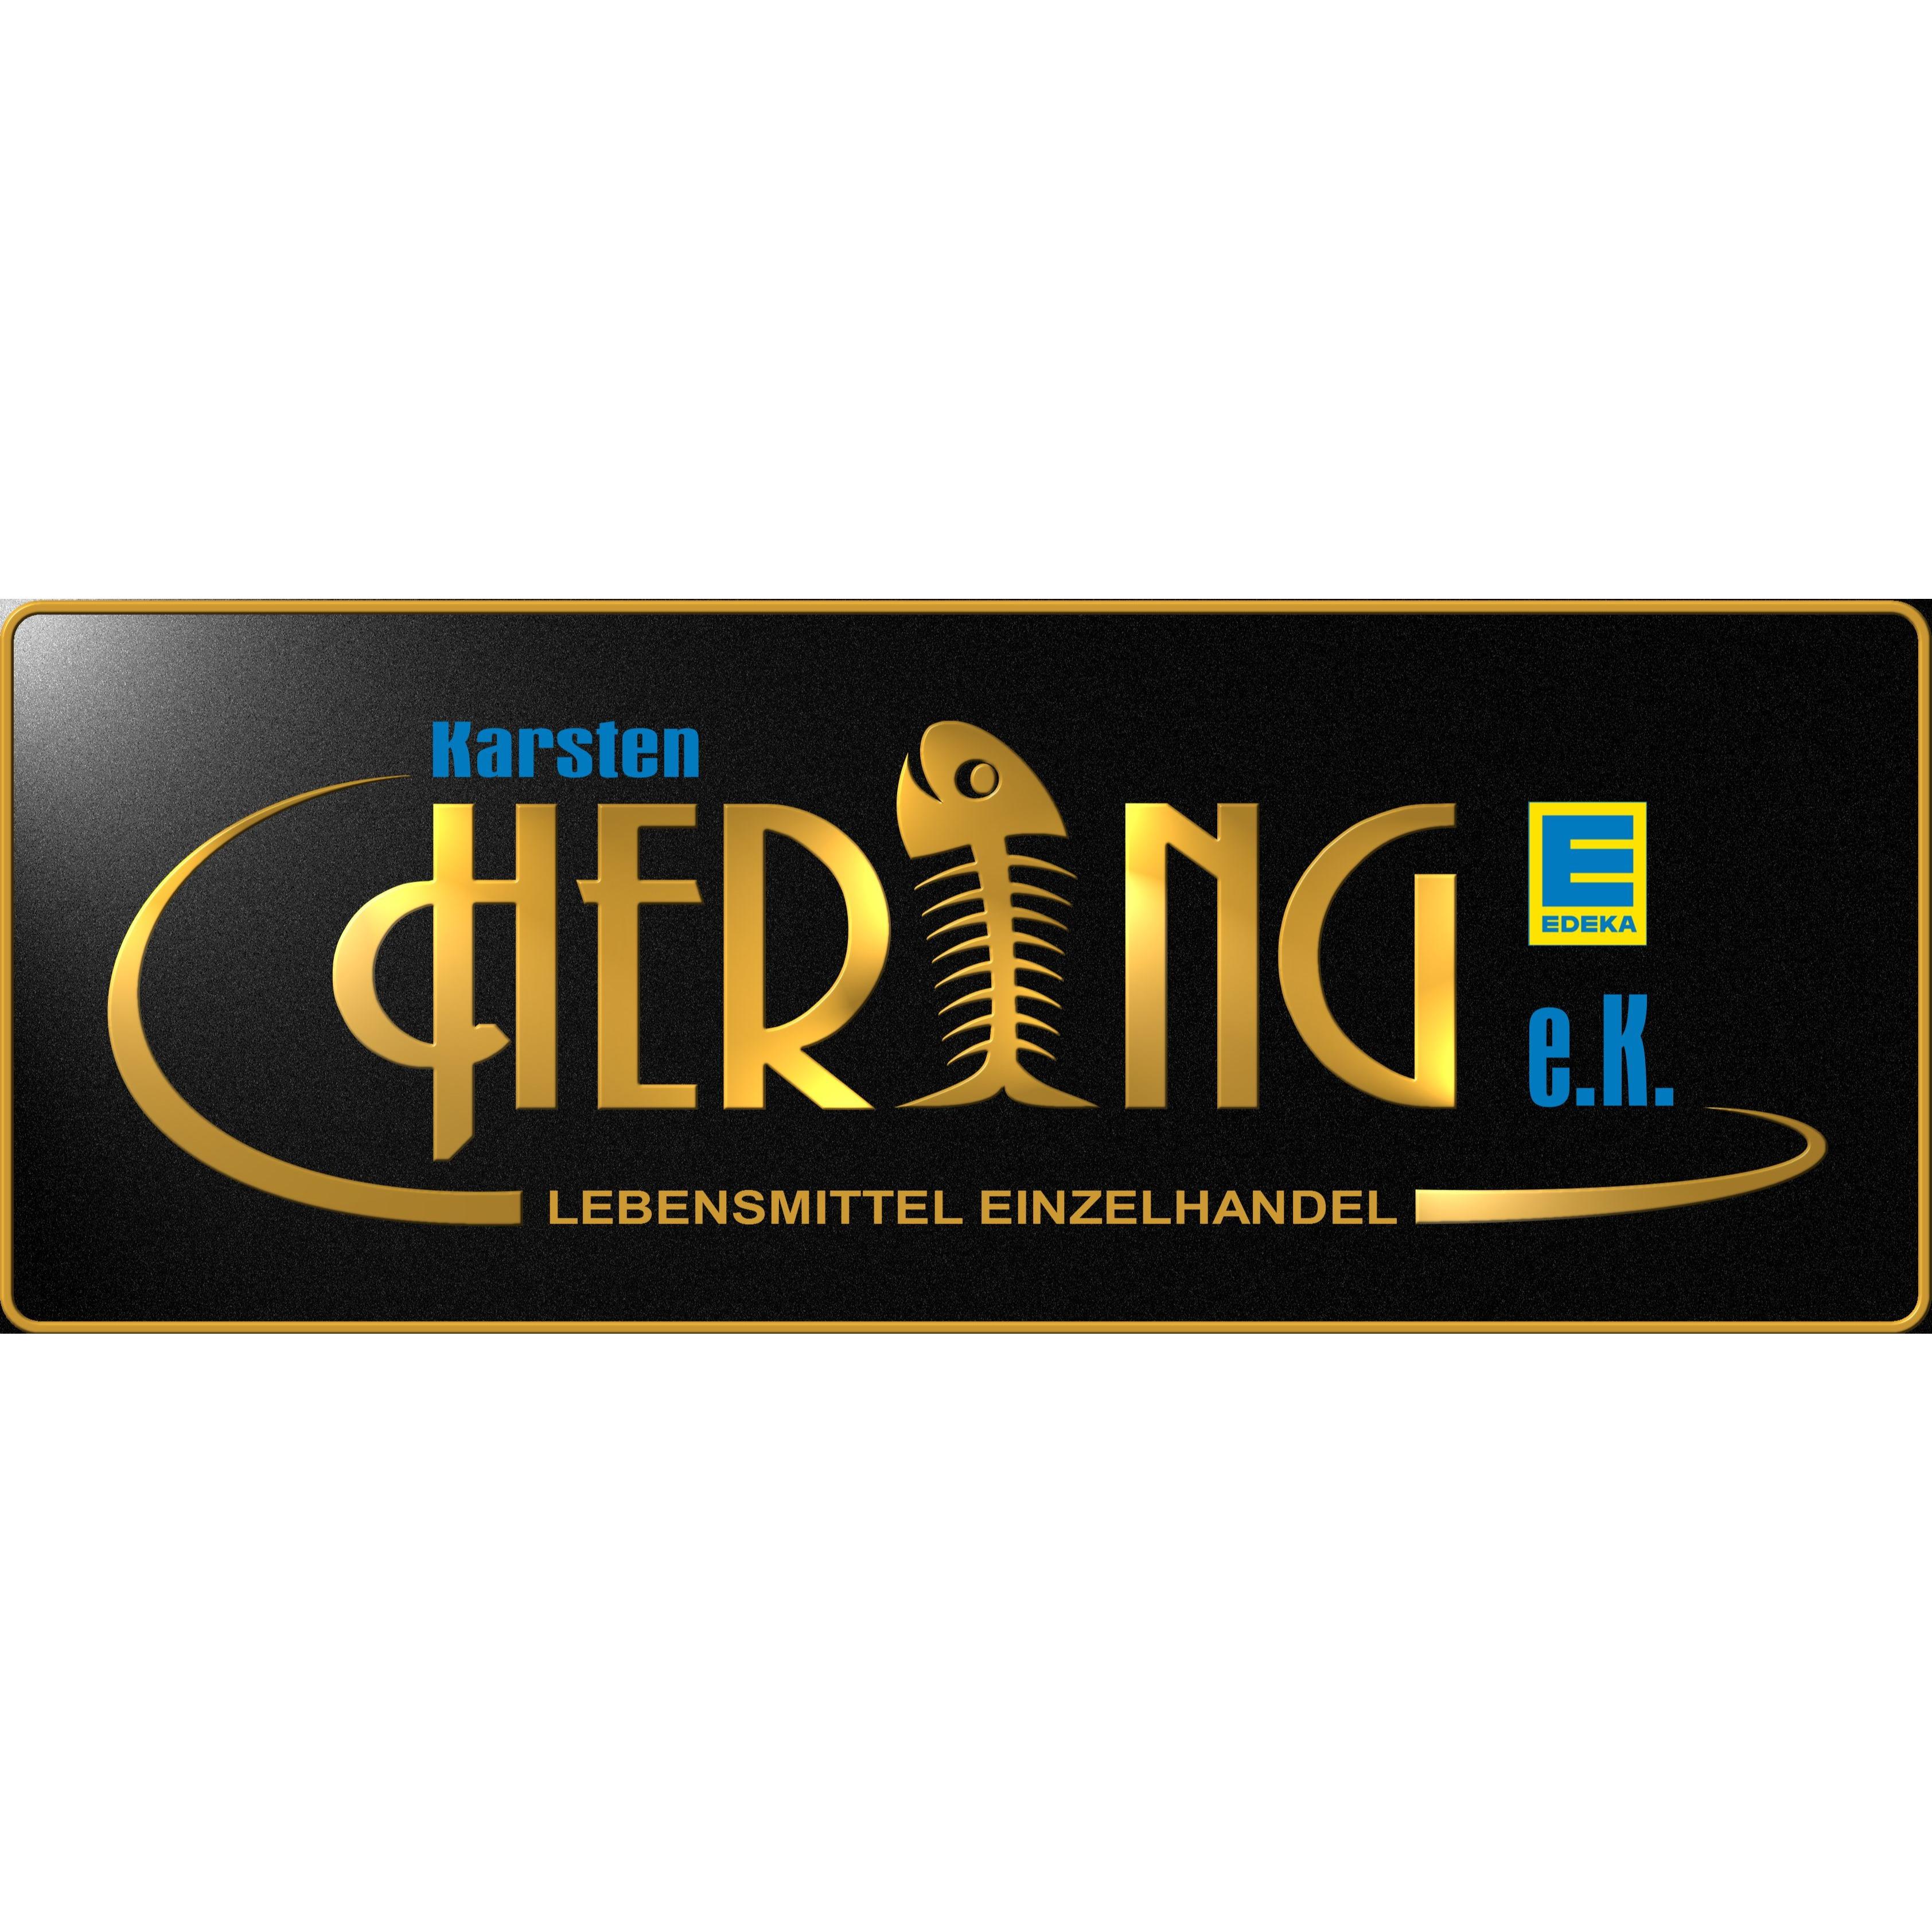 Edeka Hering in Greußen